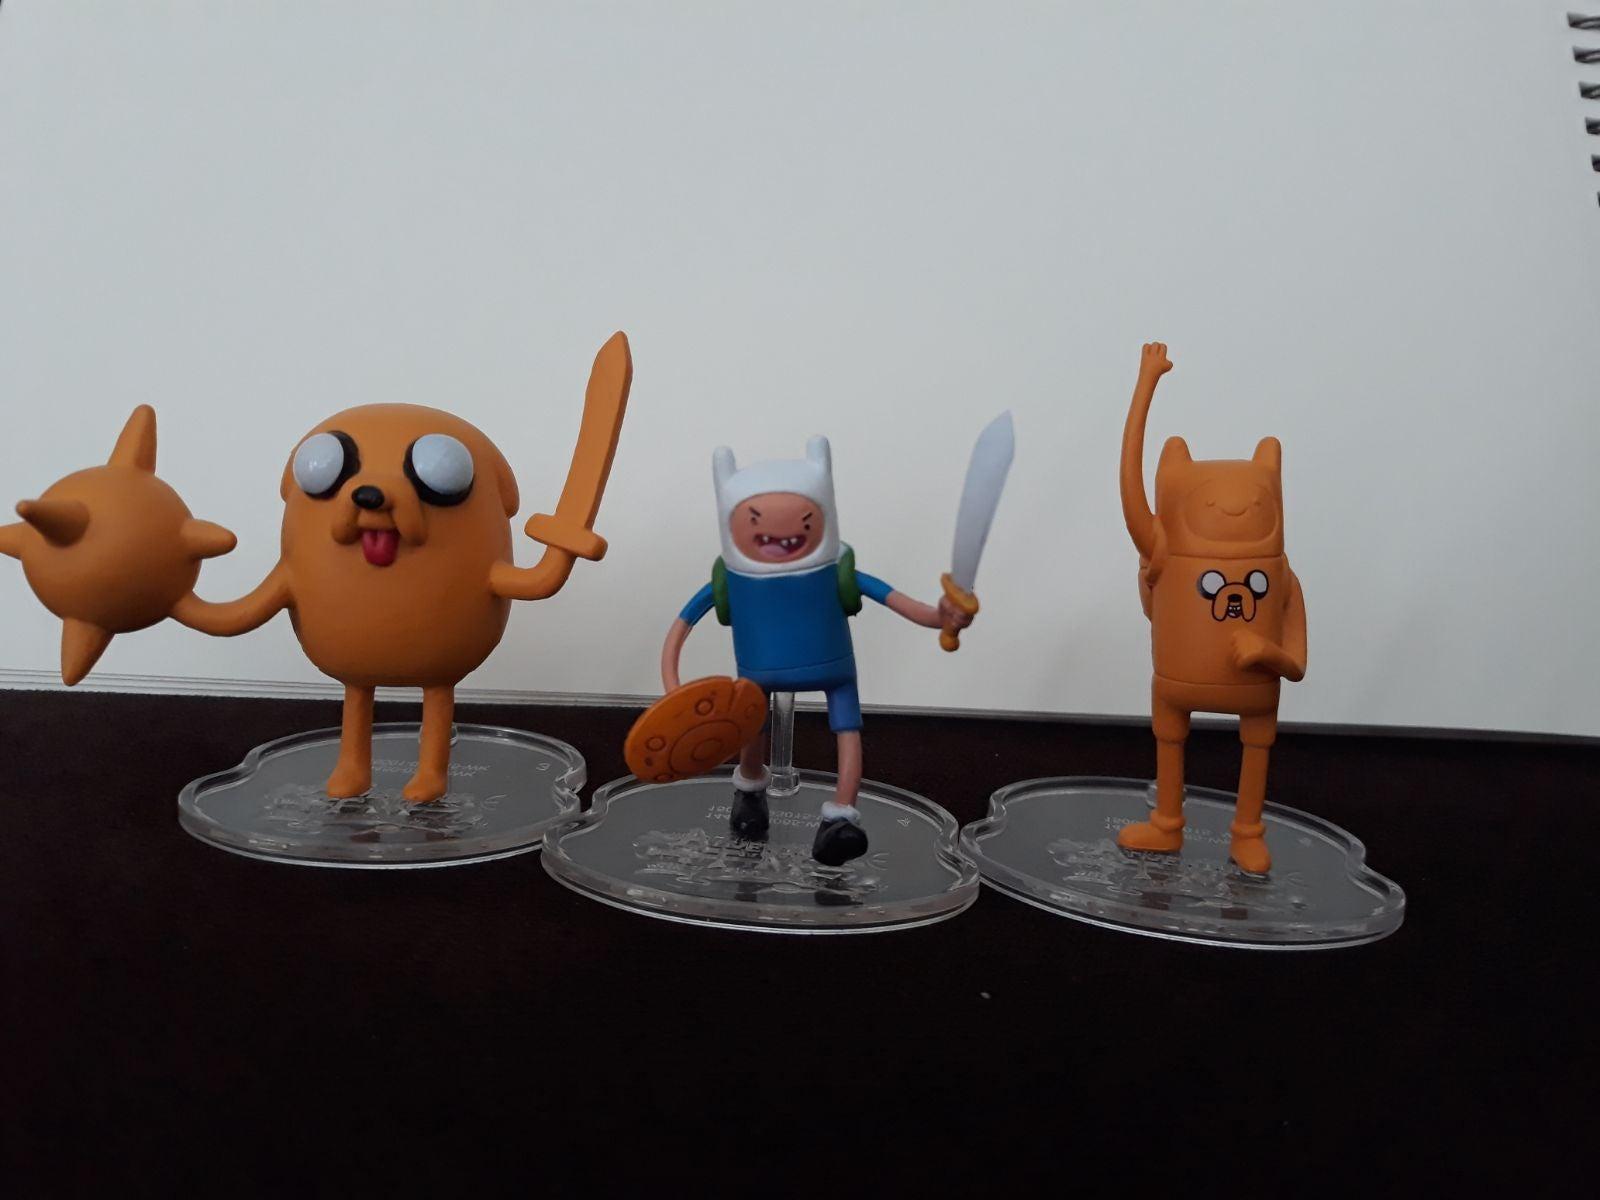 finn And Jake Figurines